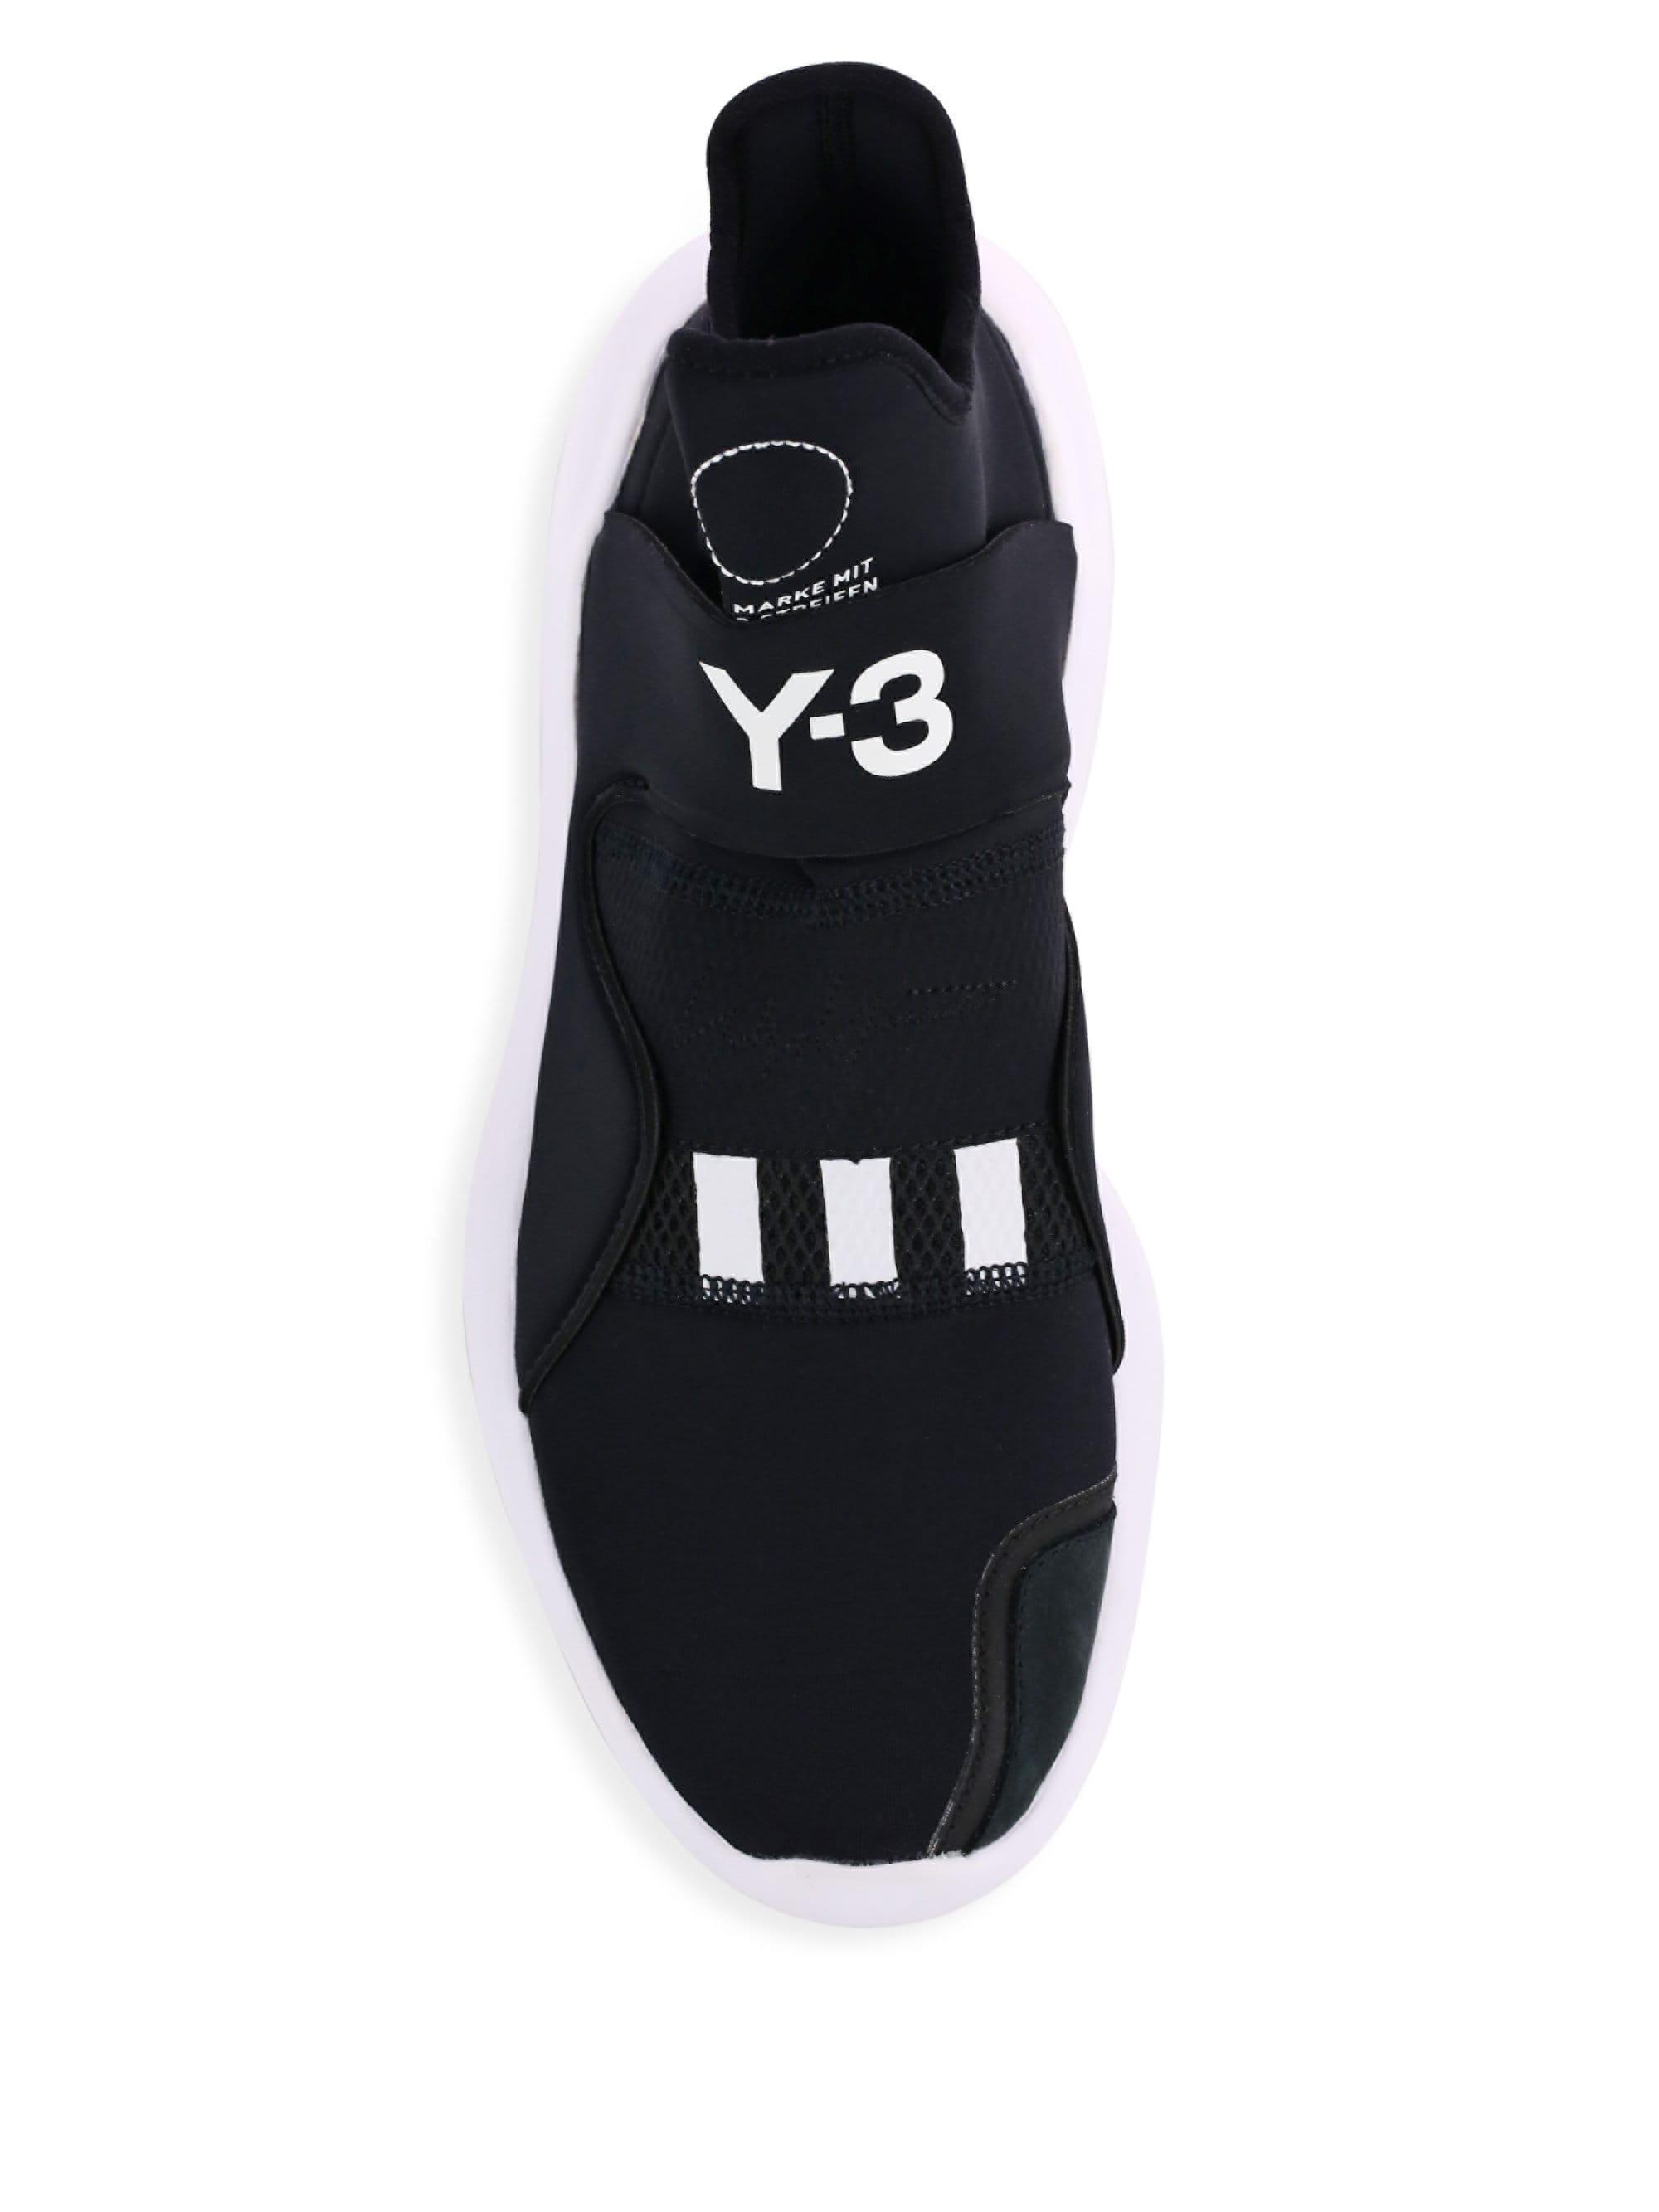 separation shoes d7e68 c314b Y-3 Men s Suberou Stretch Sneakers - Black - Size 9 in Black for Men - Lyst